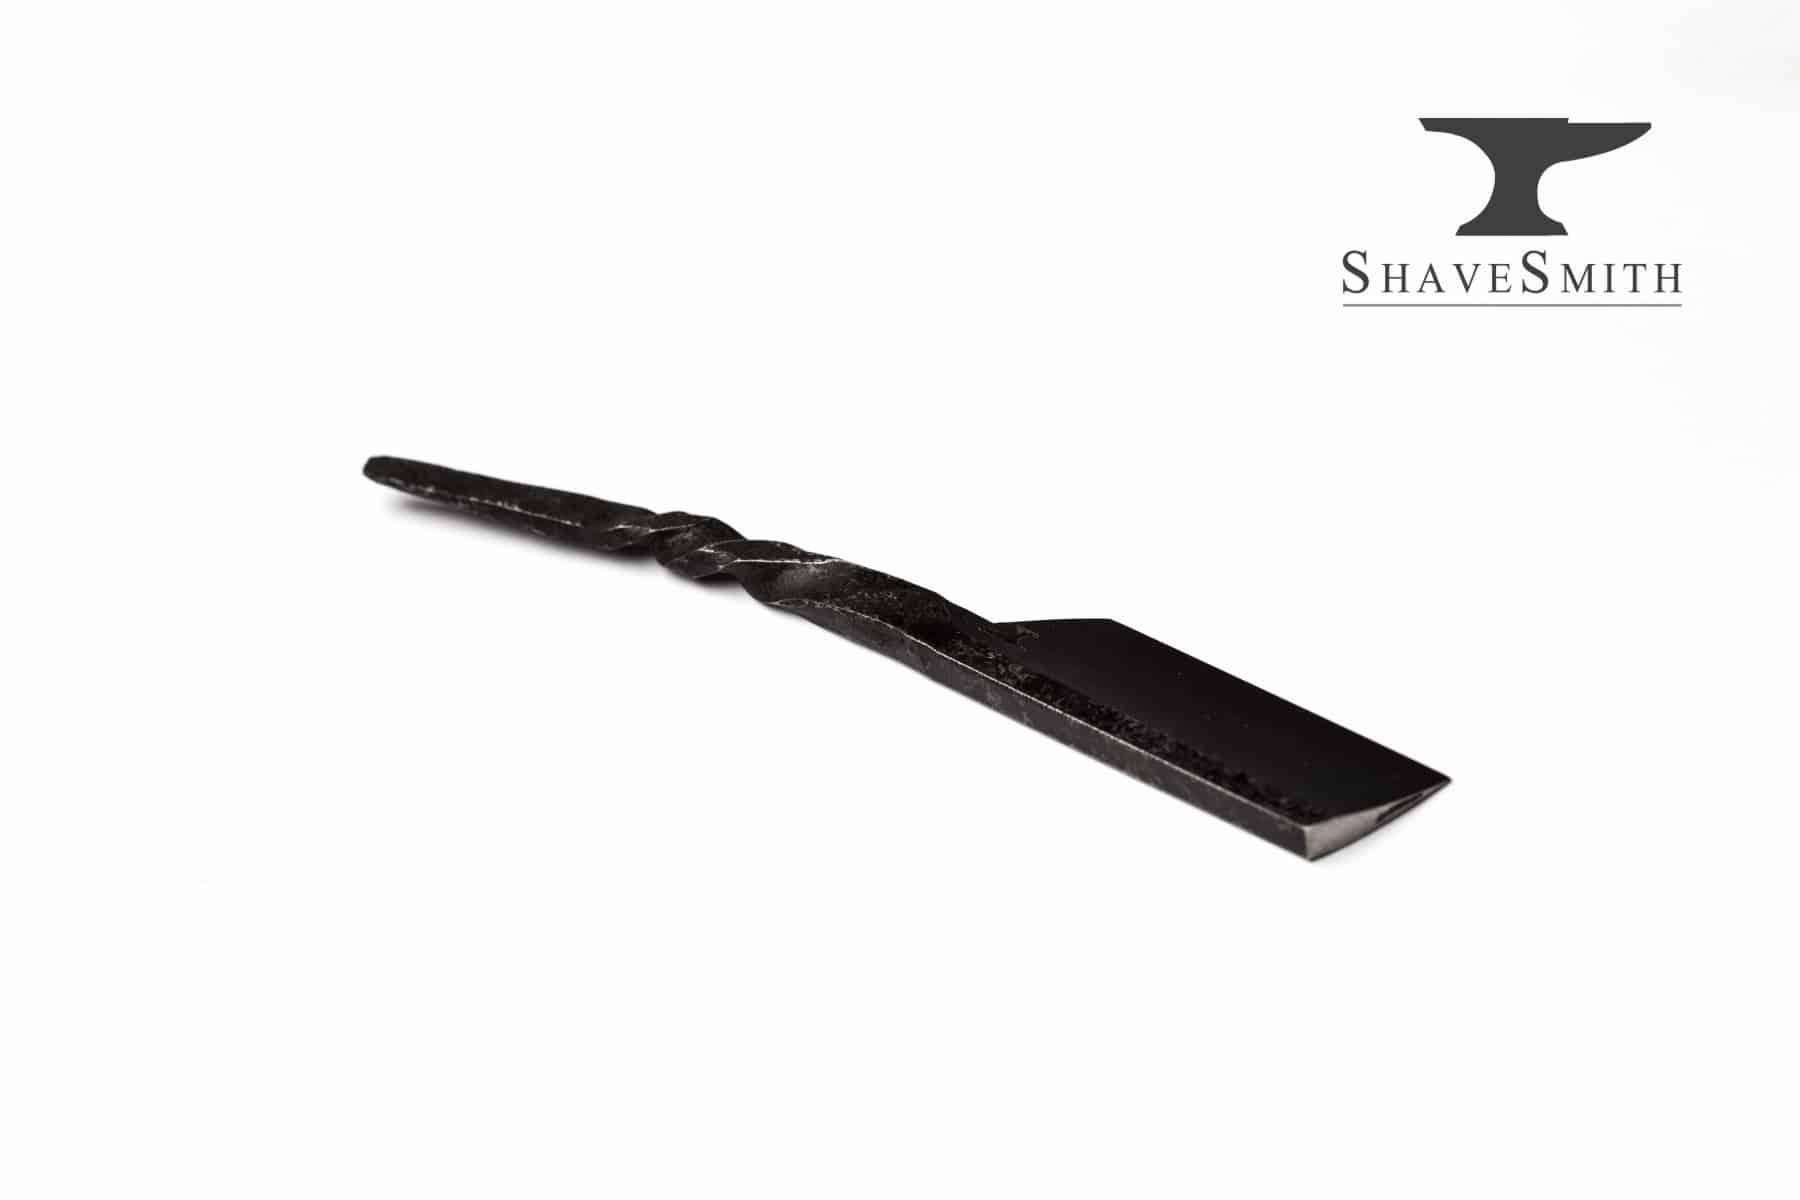 A hand forged custom kamisori razor with twisted handle.